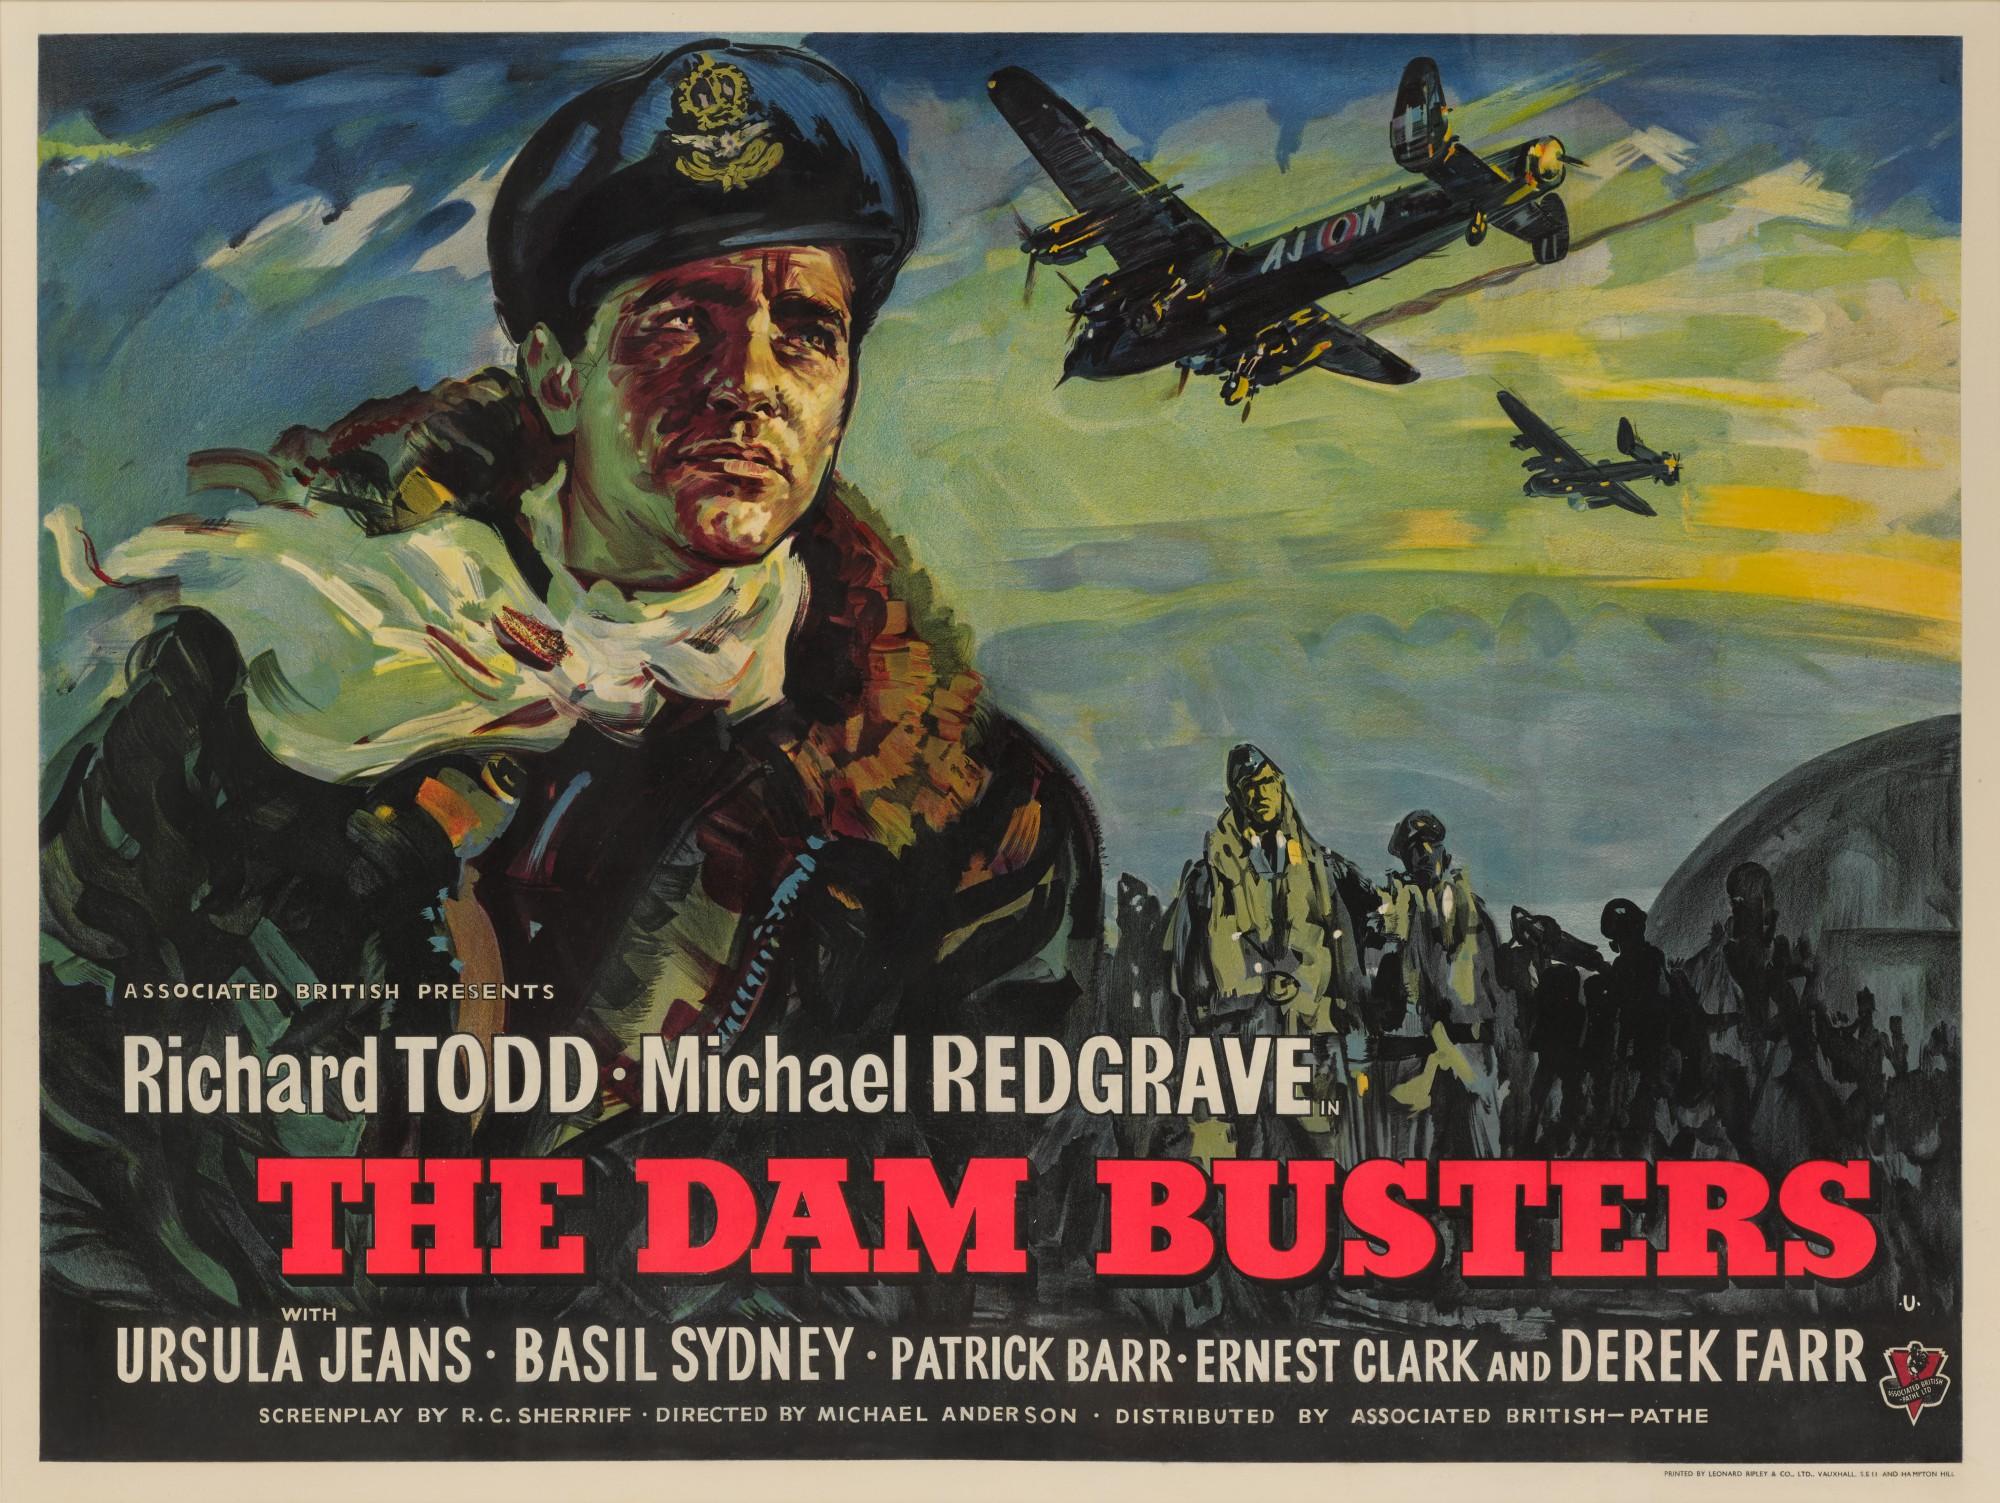 THE DAM BUSTERS (1954) POSTER, BRITISH | Original Film Posters ...